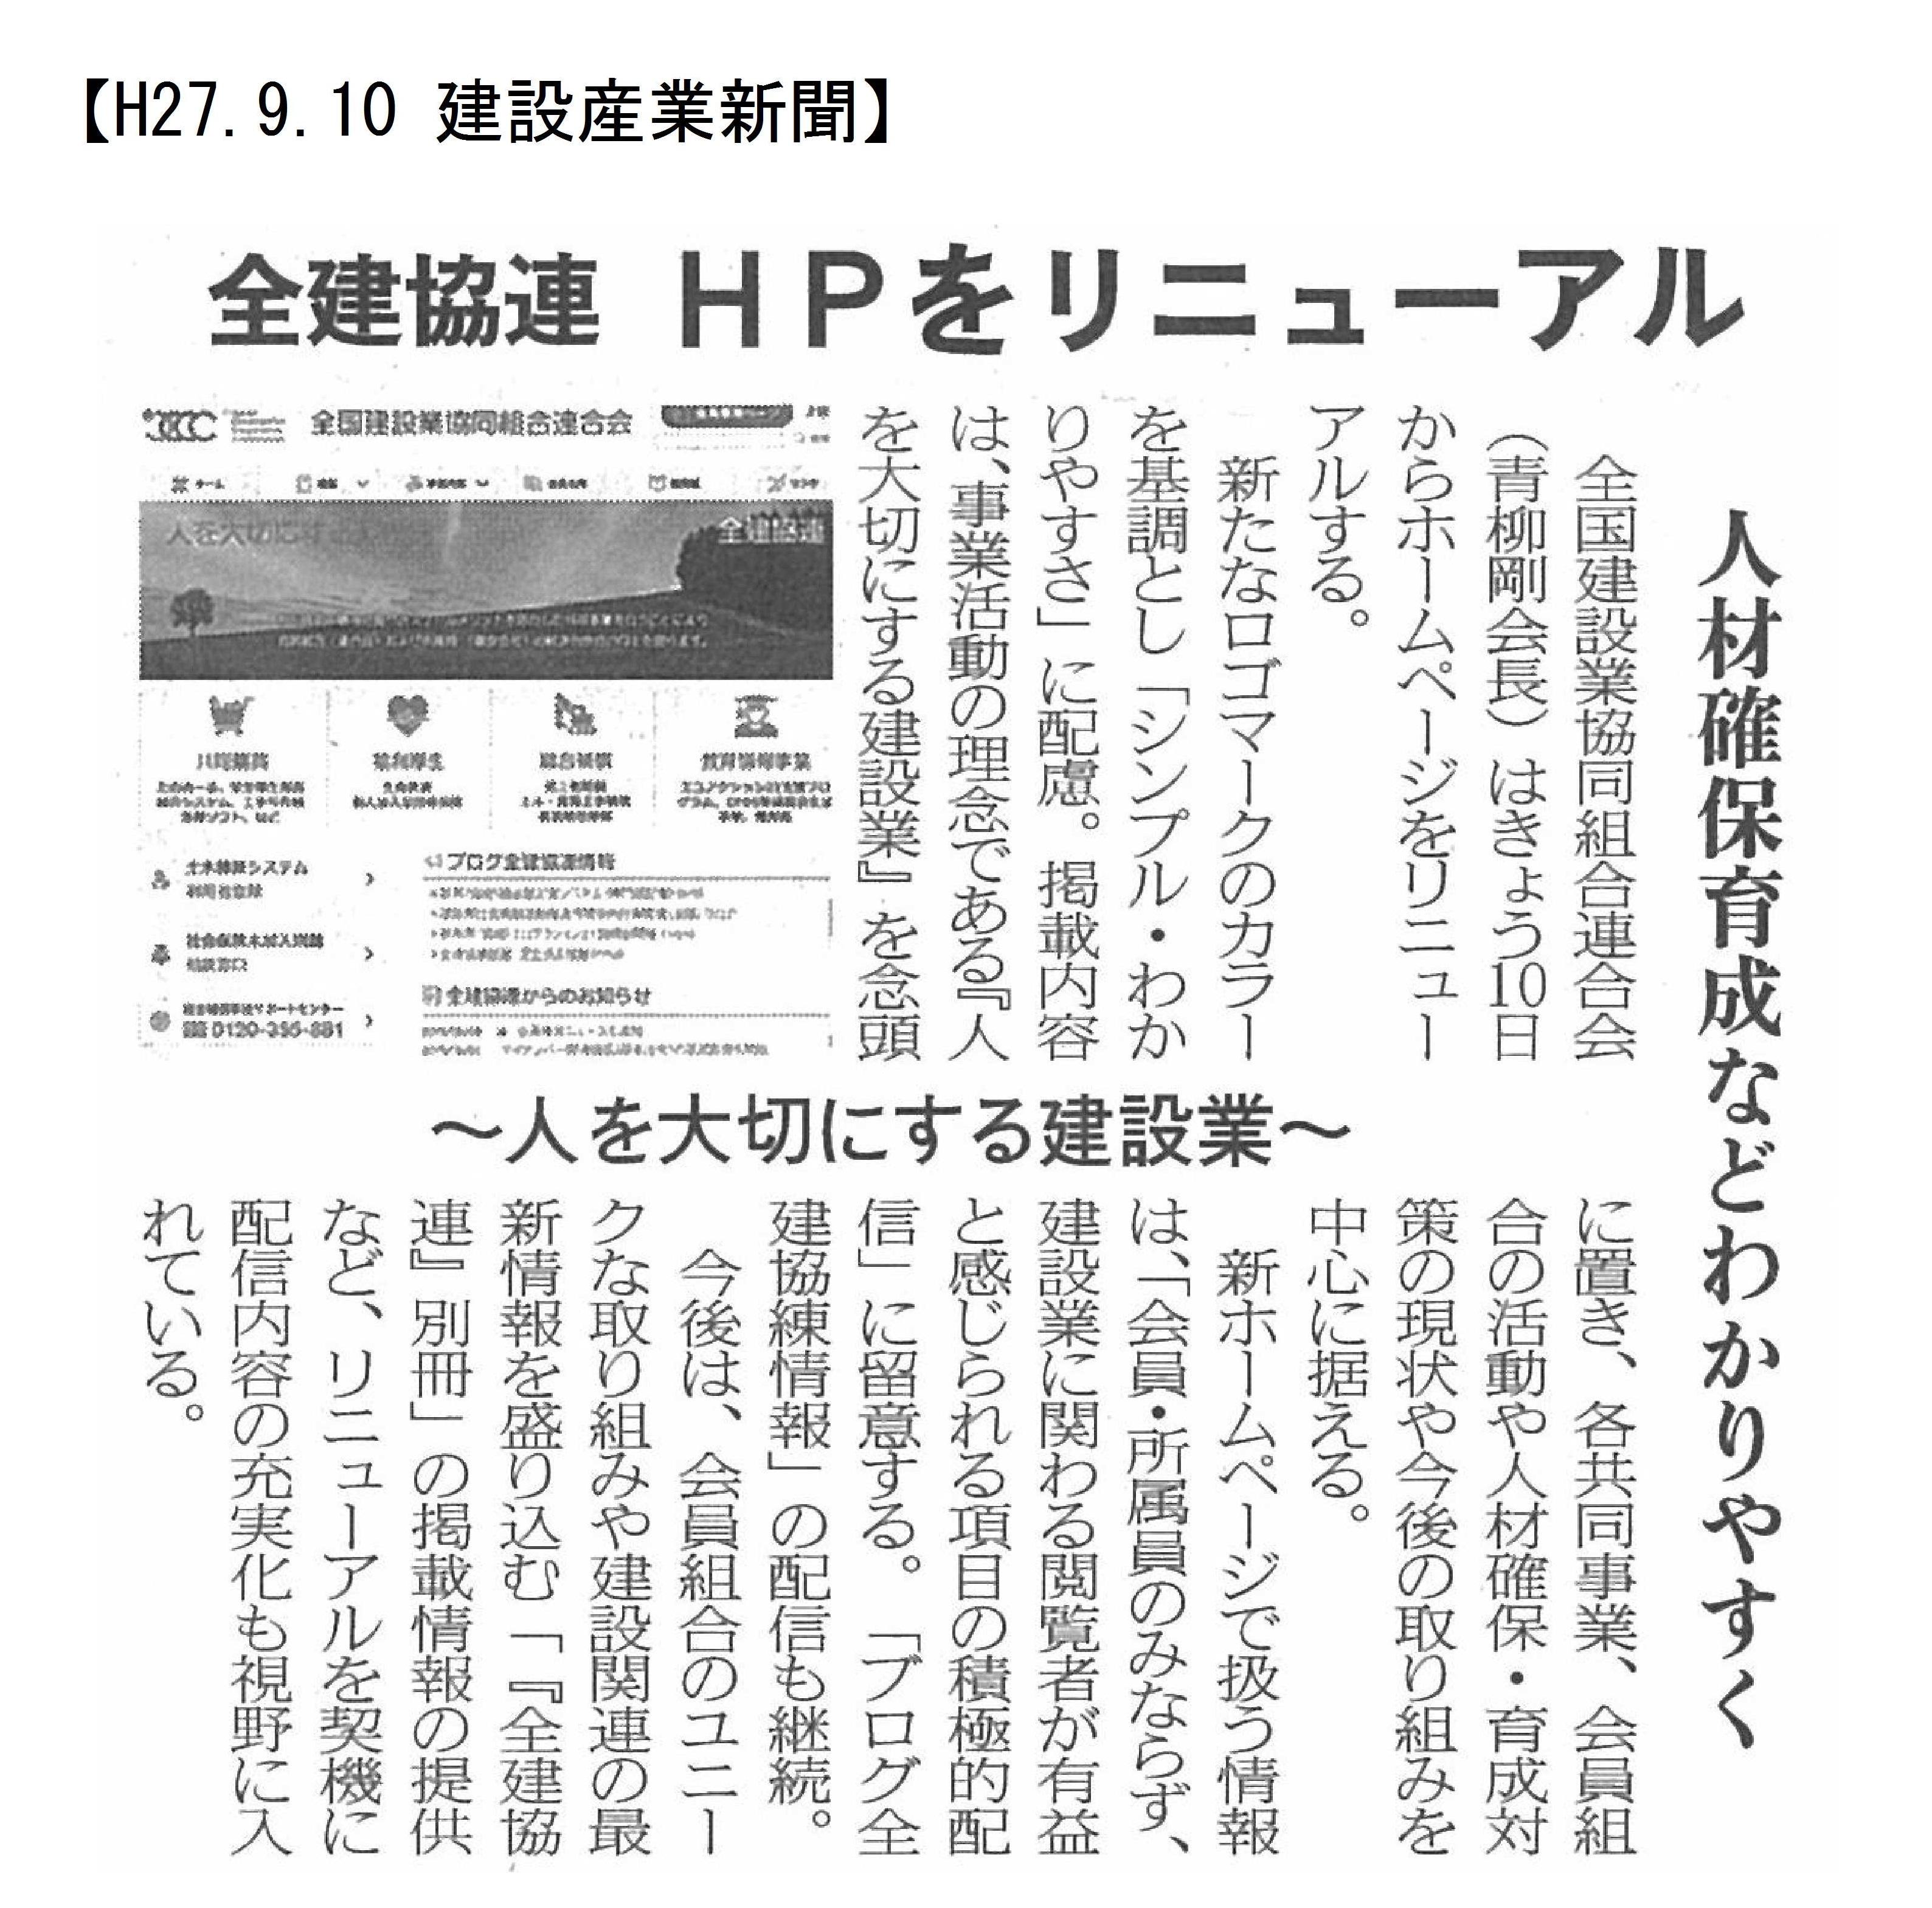 150910 HPリニューアル建設産業2